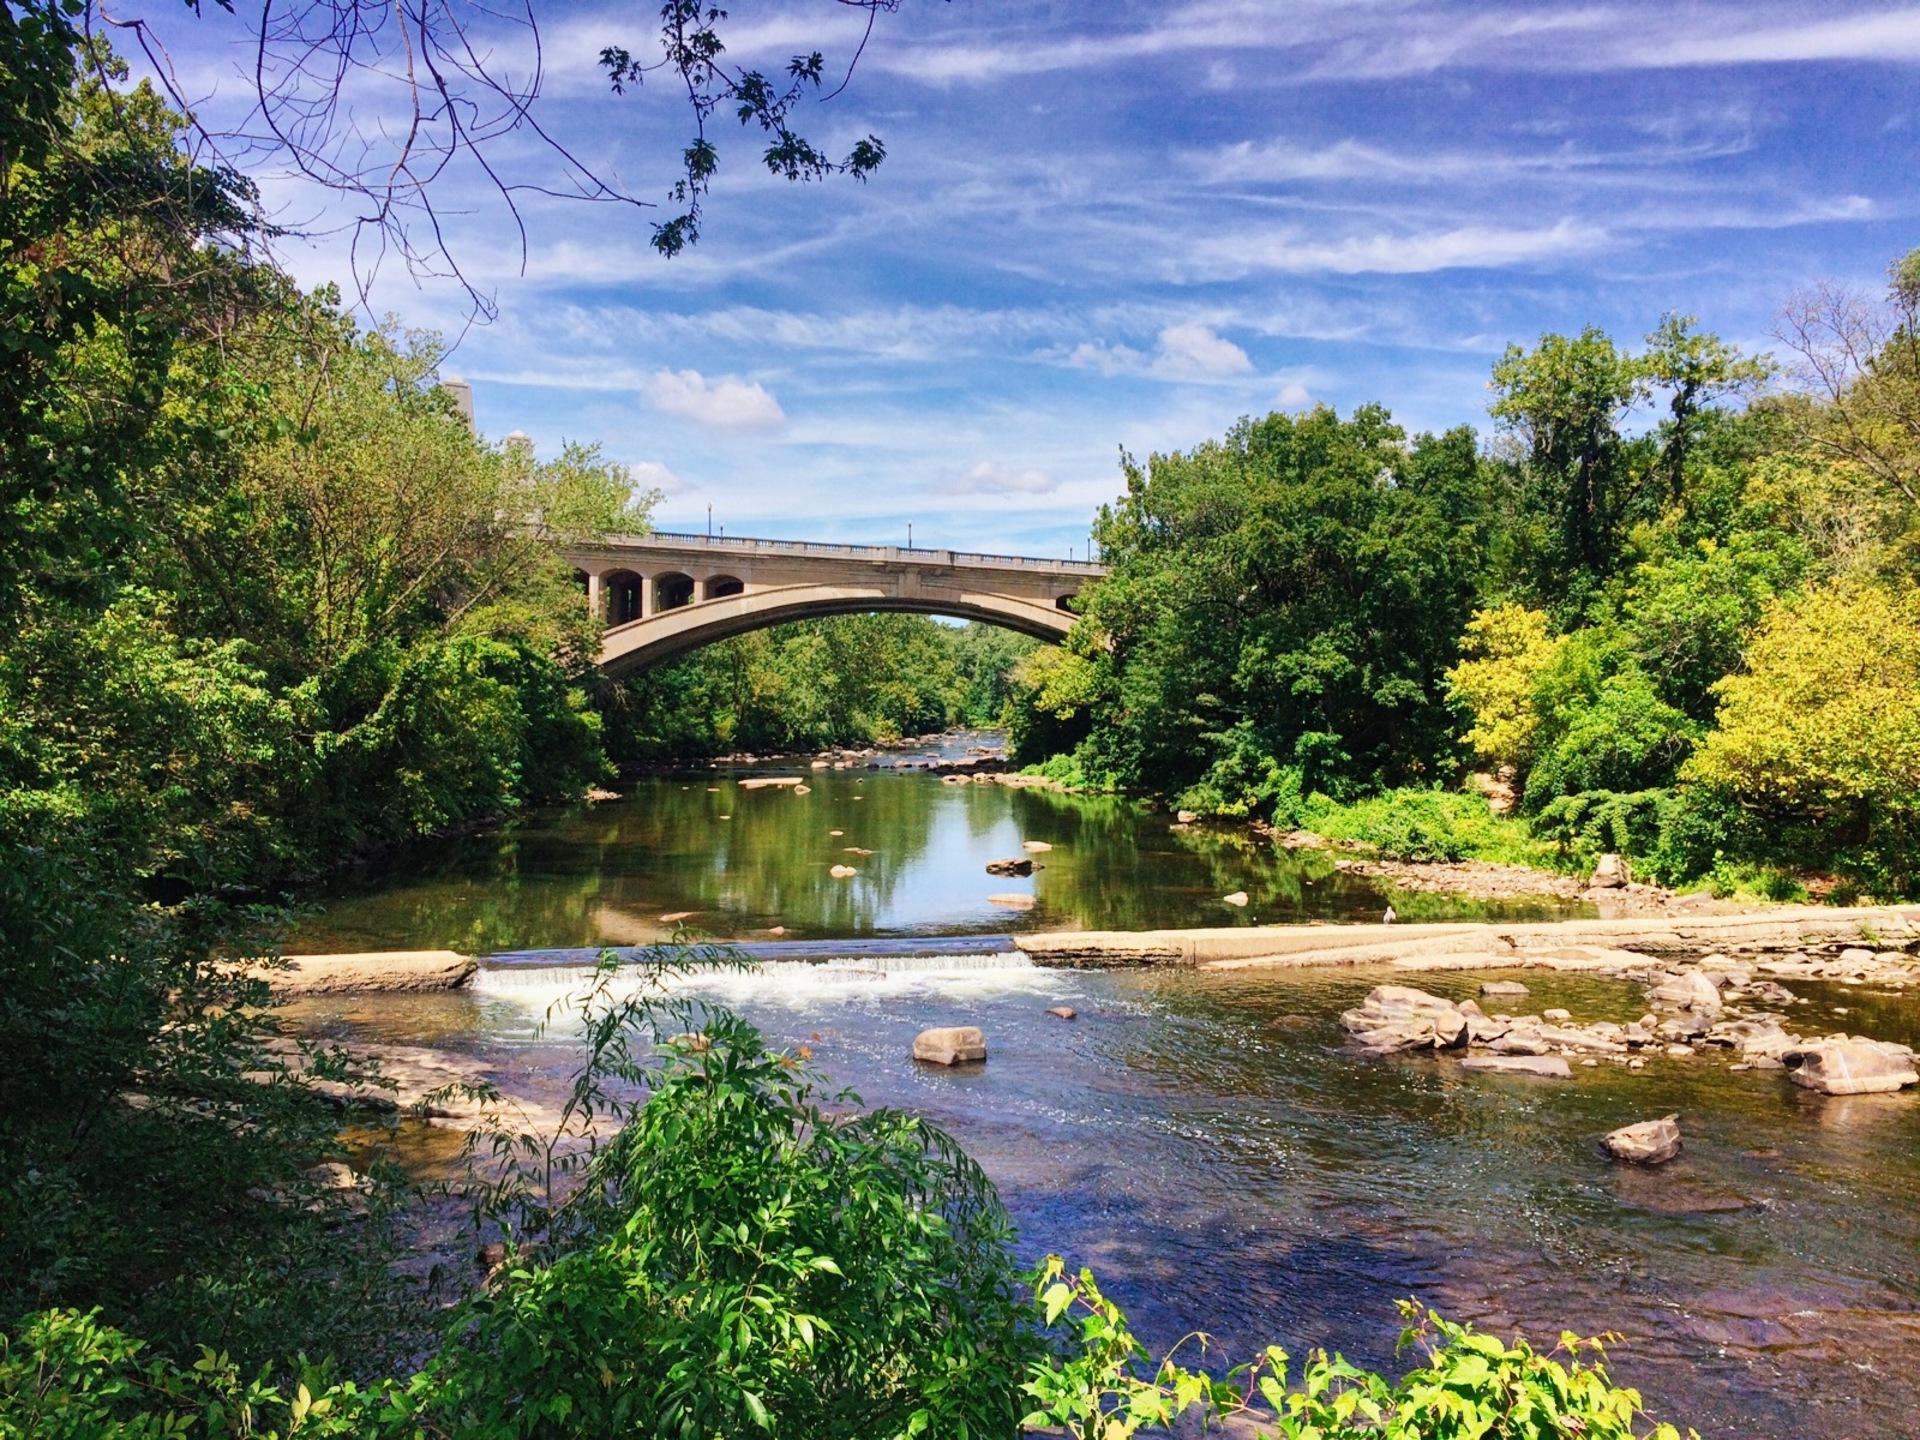 River view | ihd_capture, beautiful, bridge, outdoors